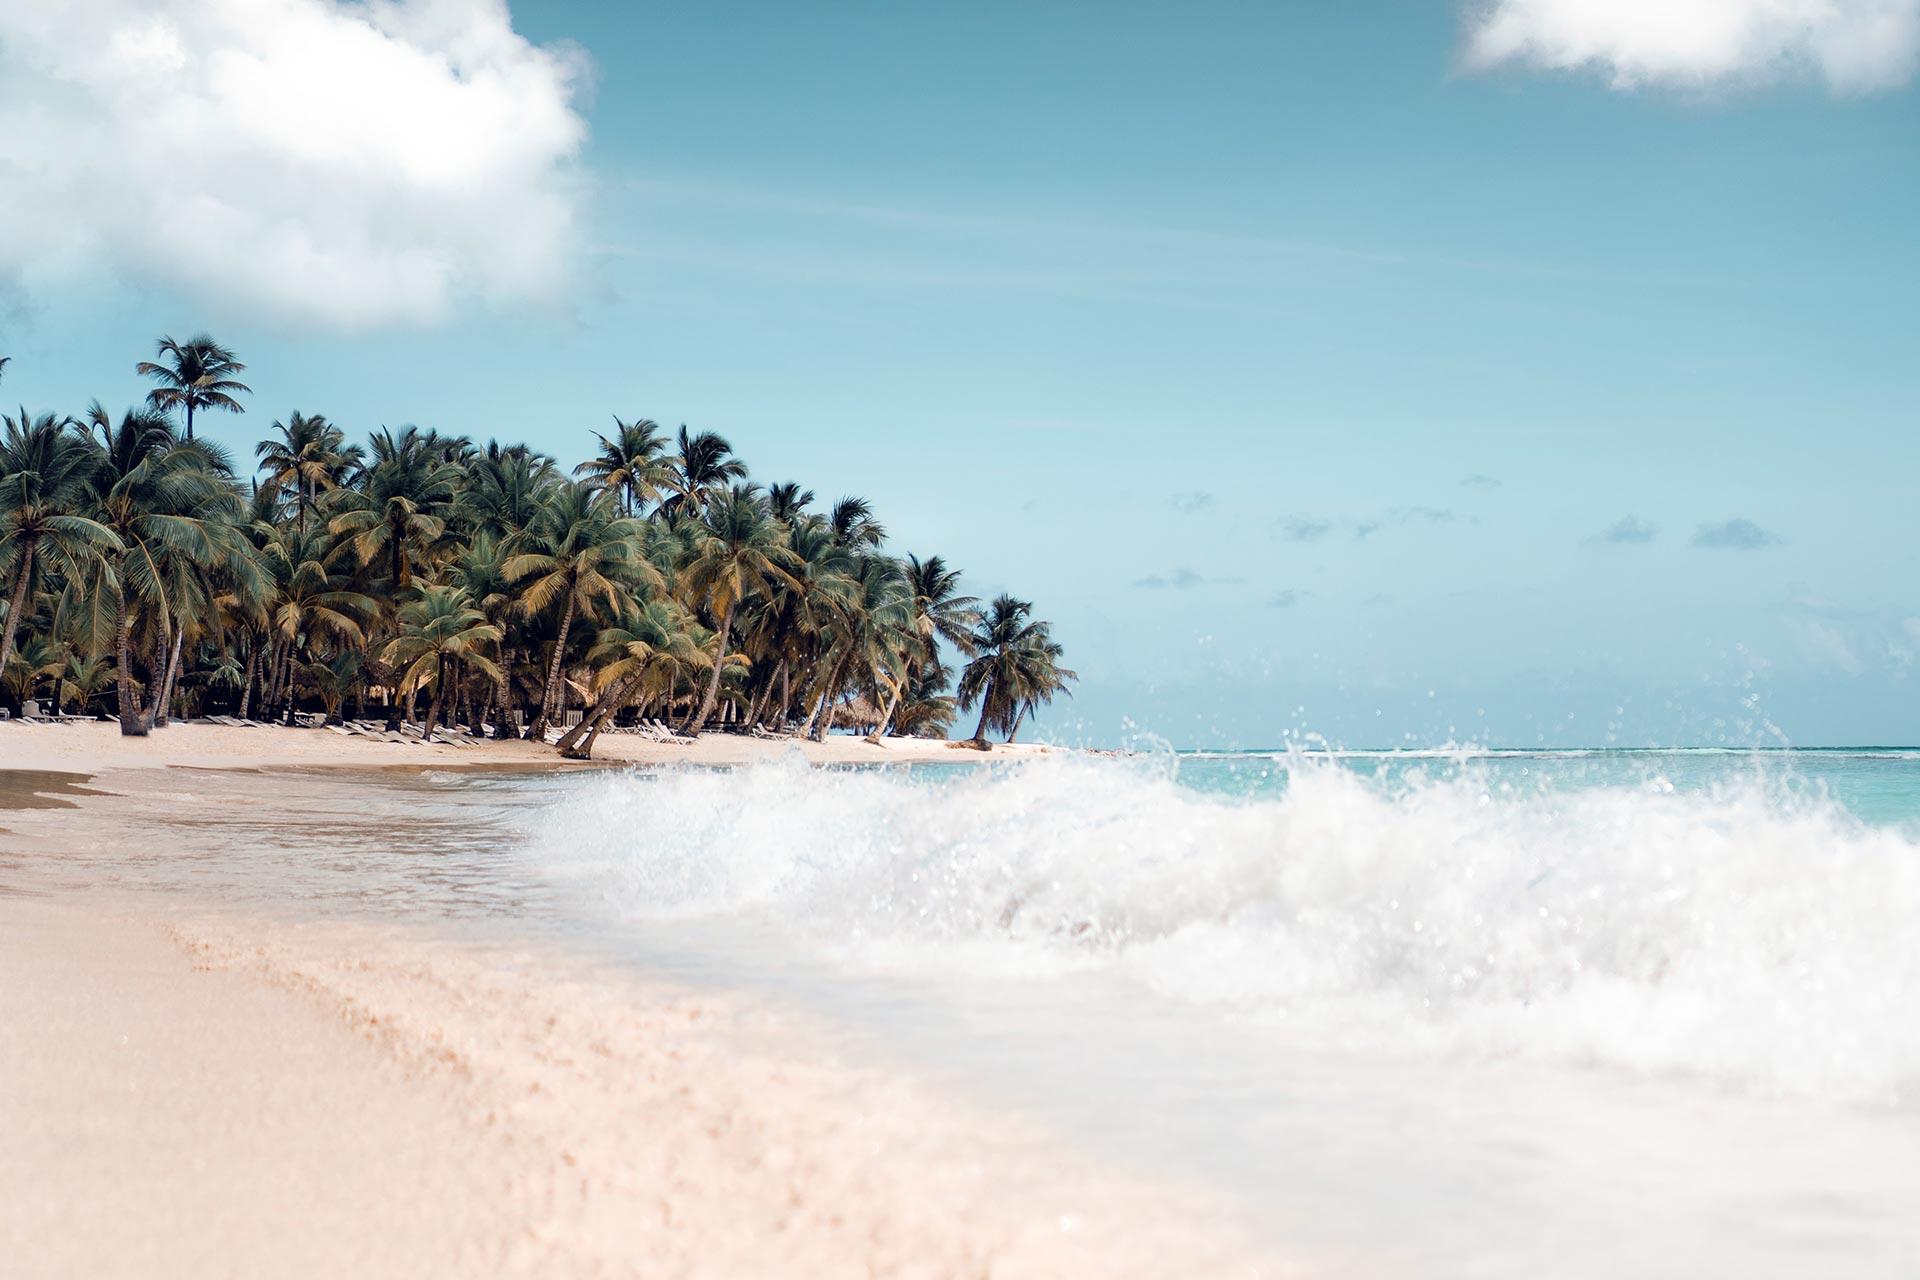 Jaco Beach on Costa Rica's Pacific coast.